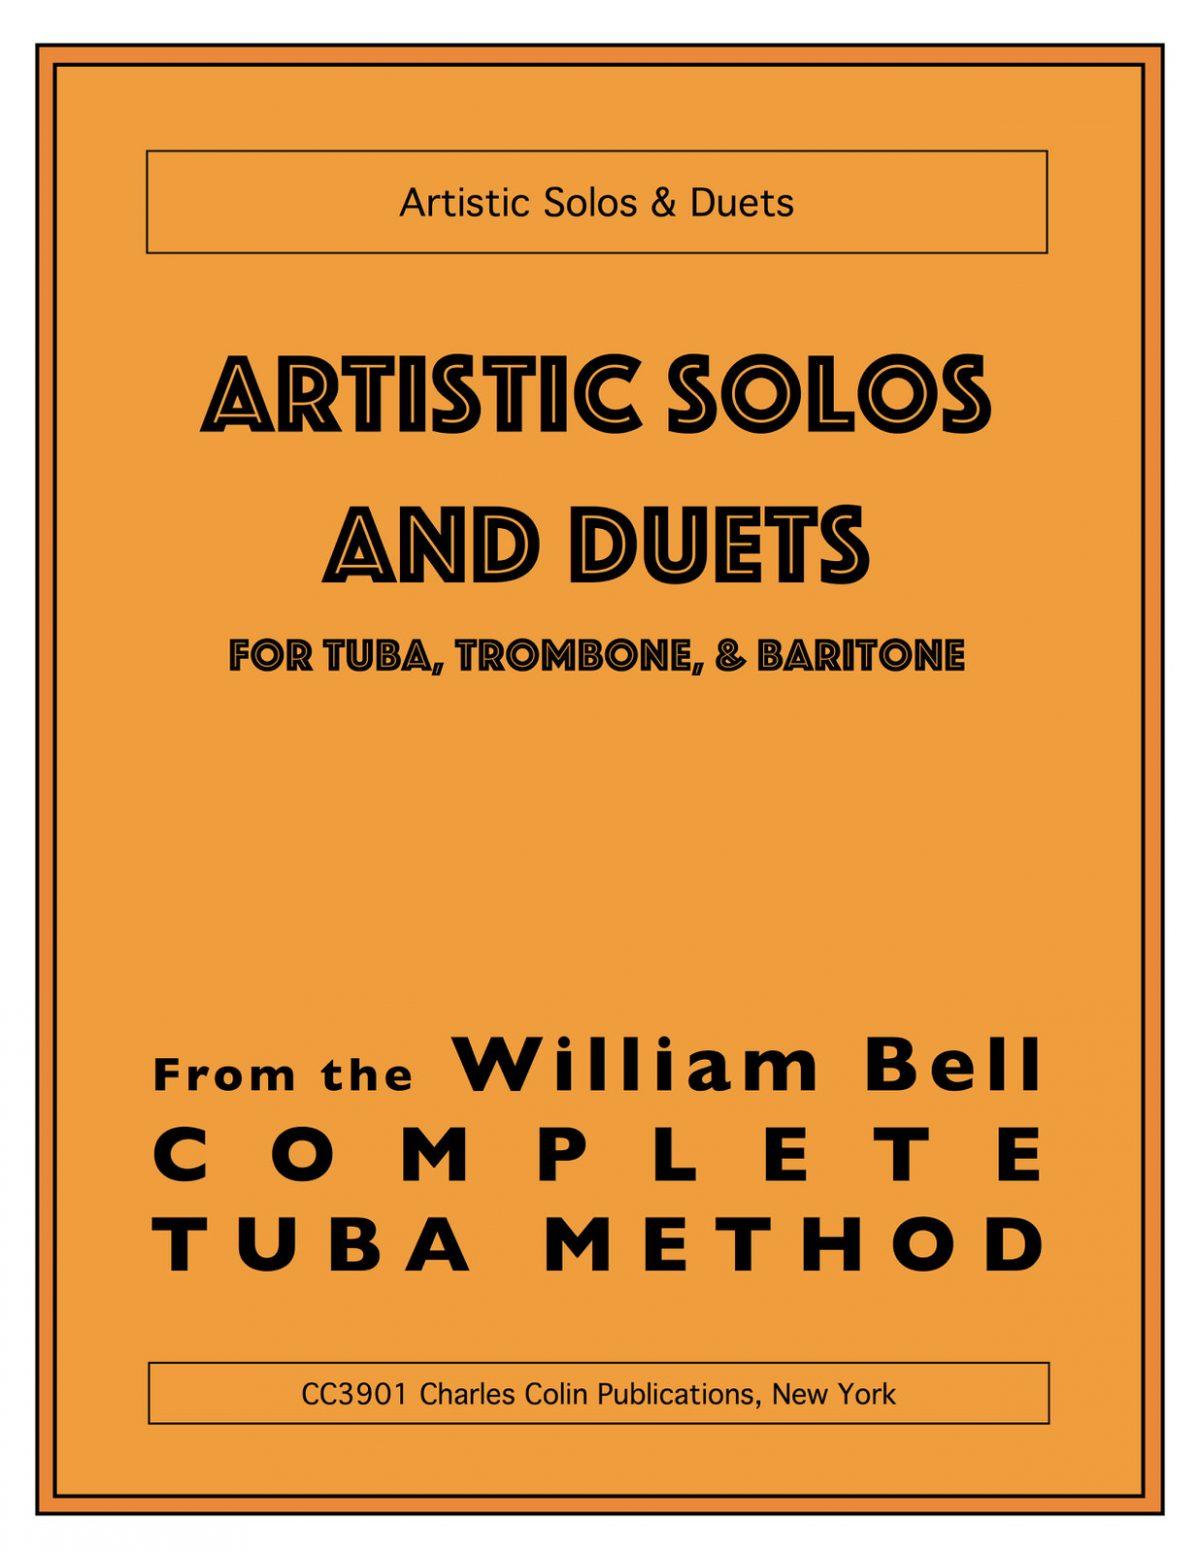 Artistic Solos & Duets